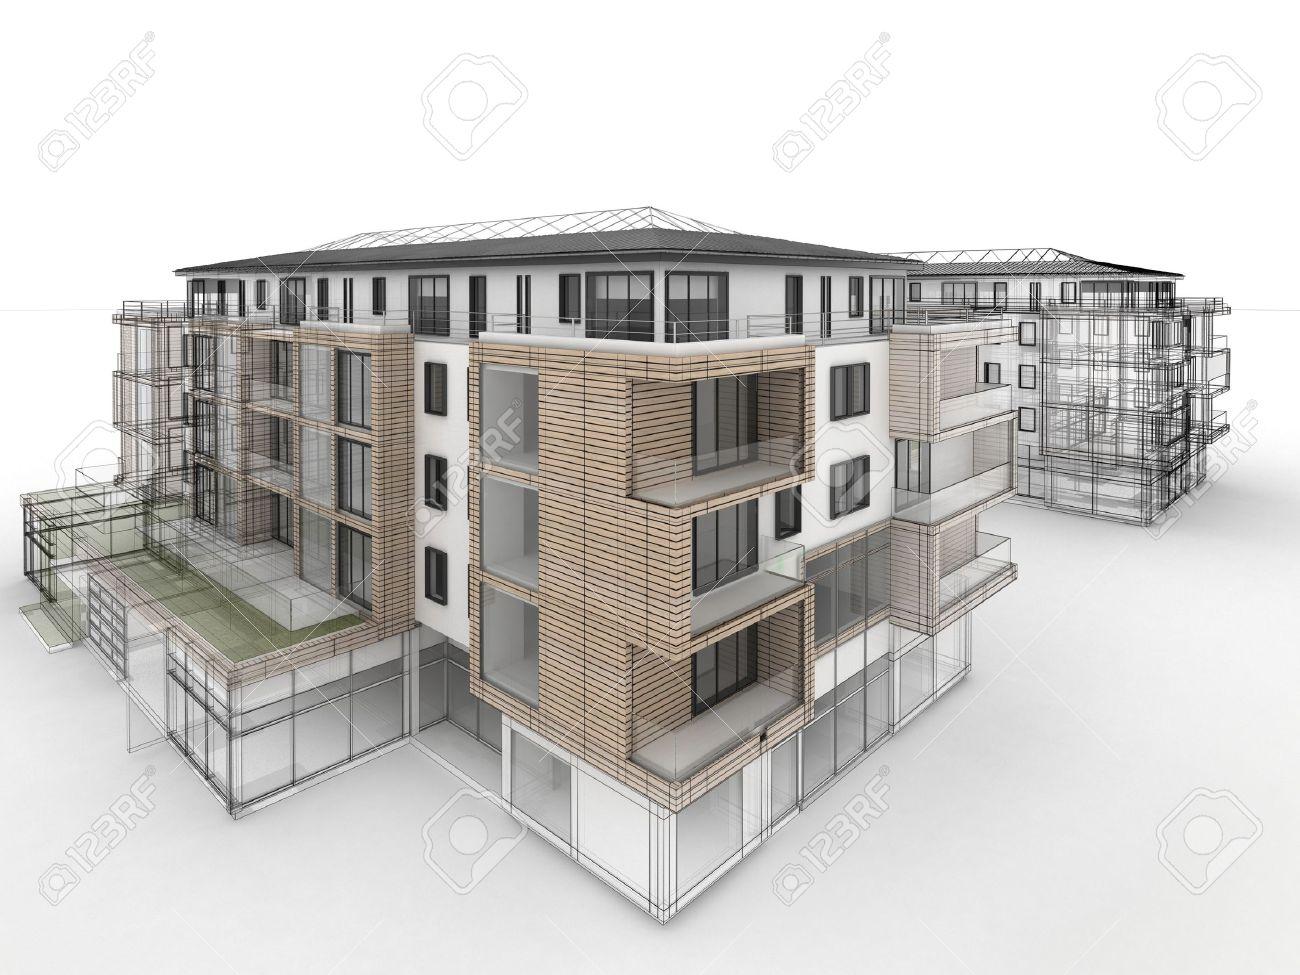 Apartment Building Drawing apartment building design progress, architecture visualization